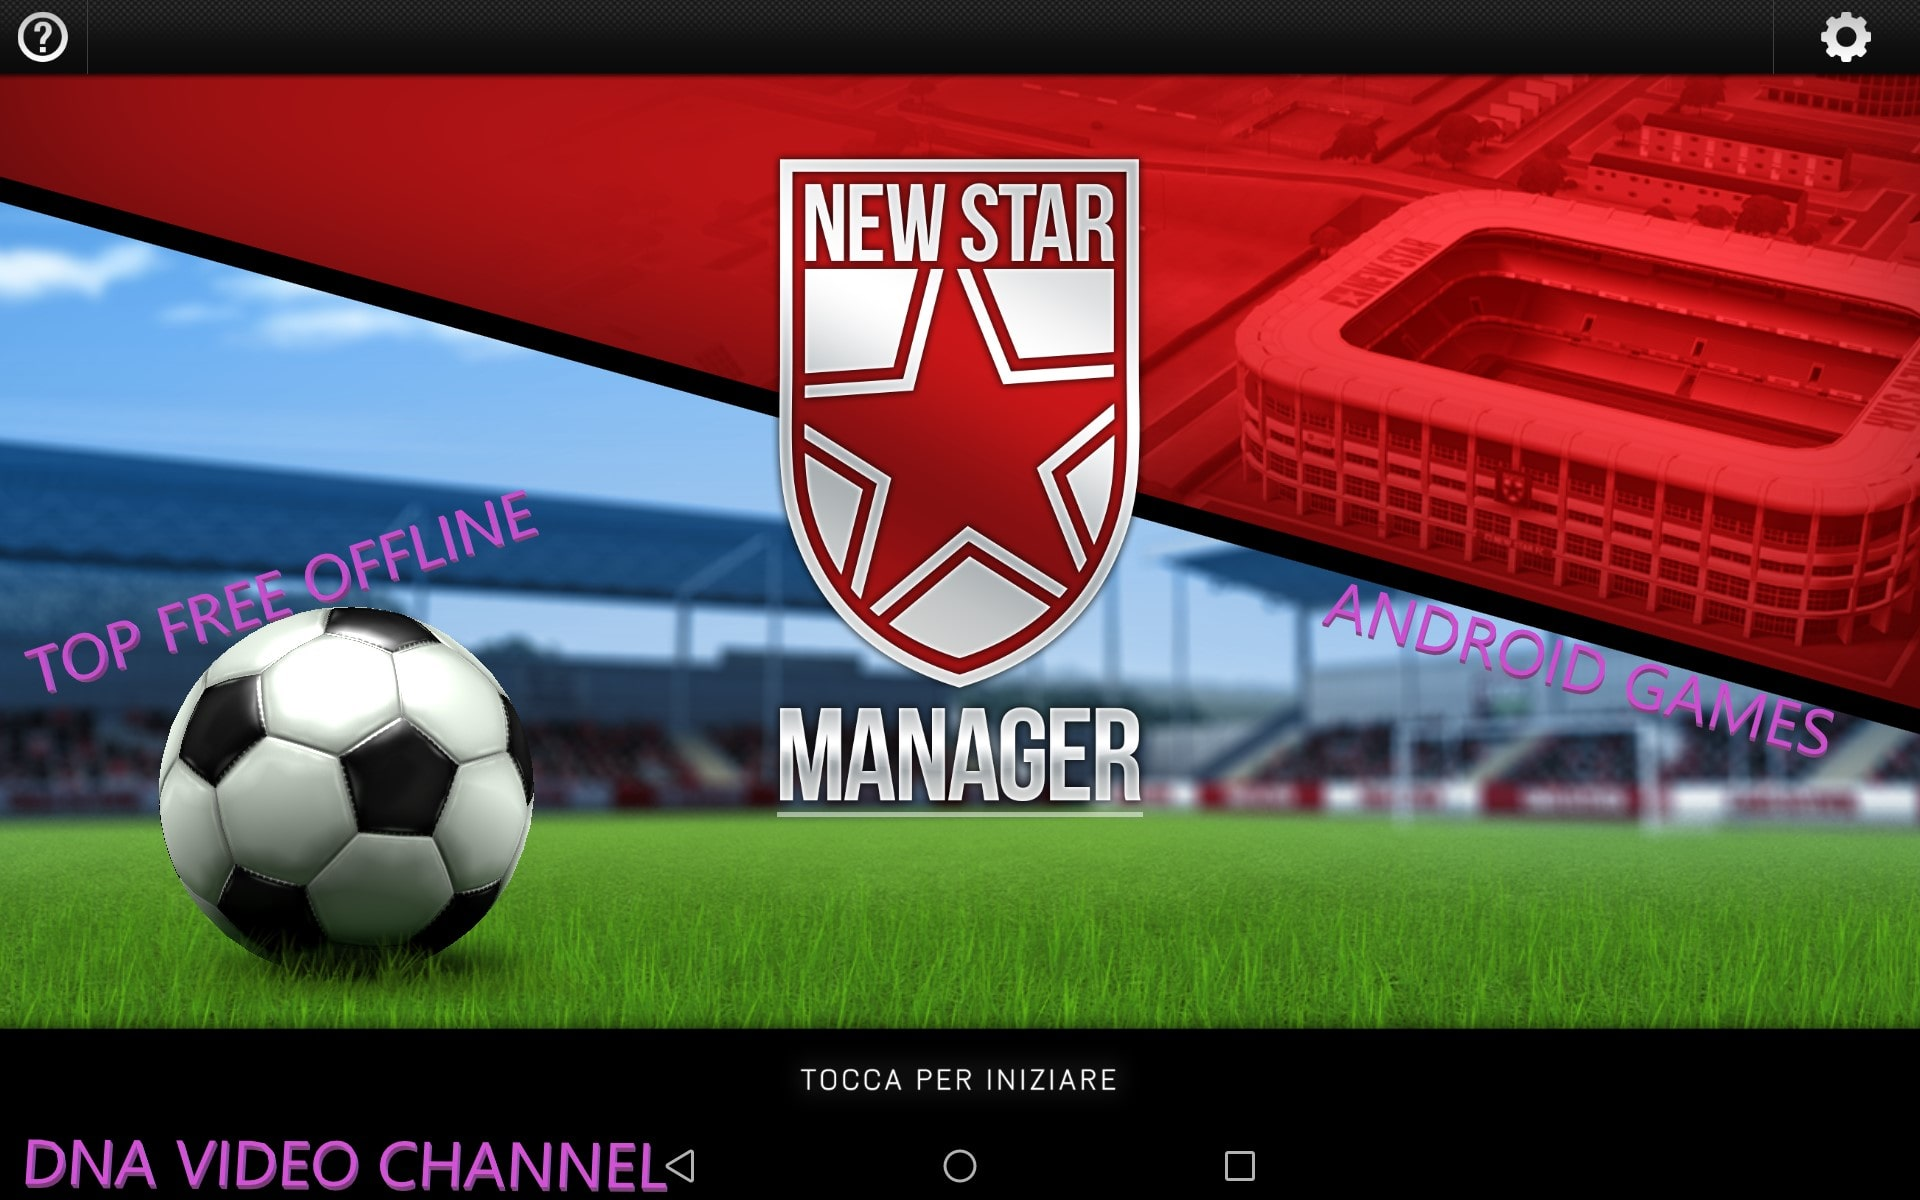 New Star Manager - Gioco calcio Android IOS Offline - Recensione trucchi